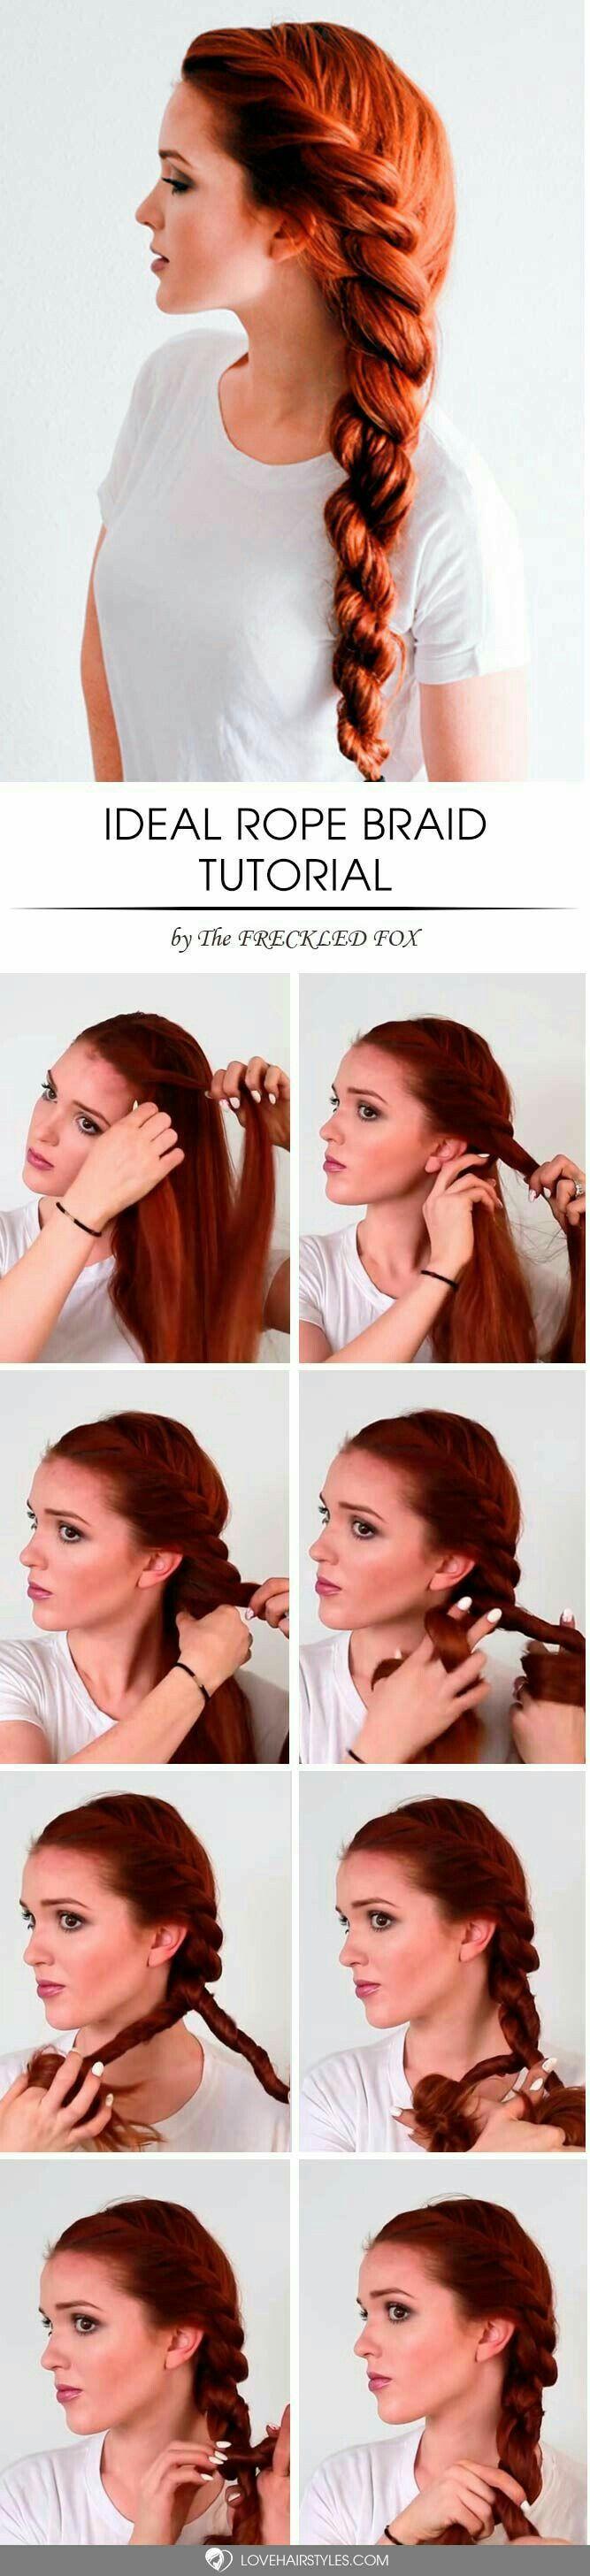 Pin by arianne kamer on hair pinterest hair style rope braid